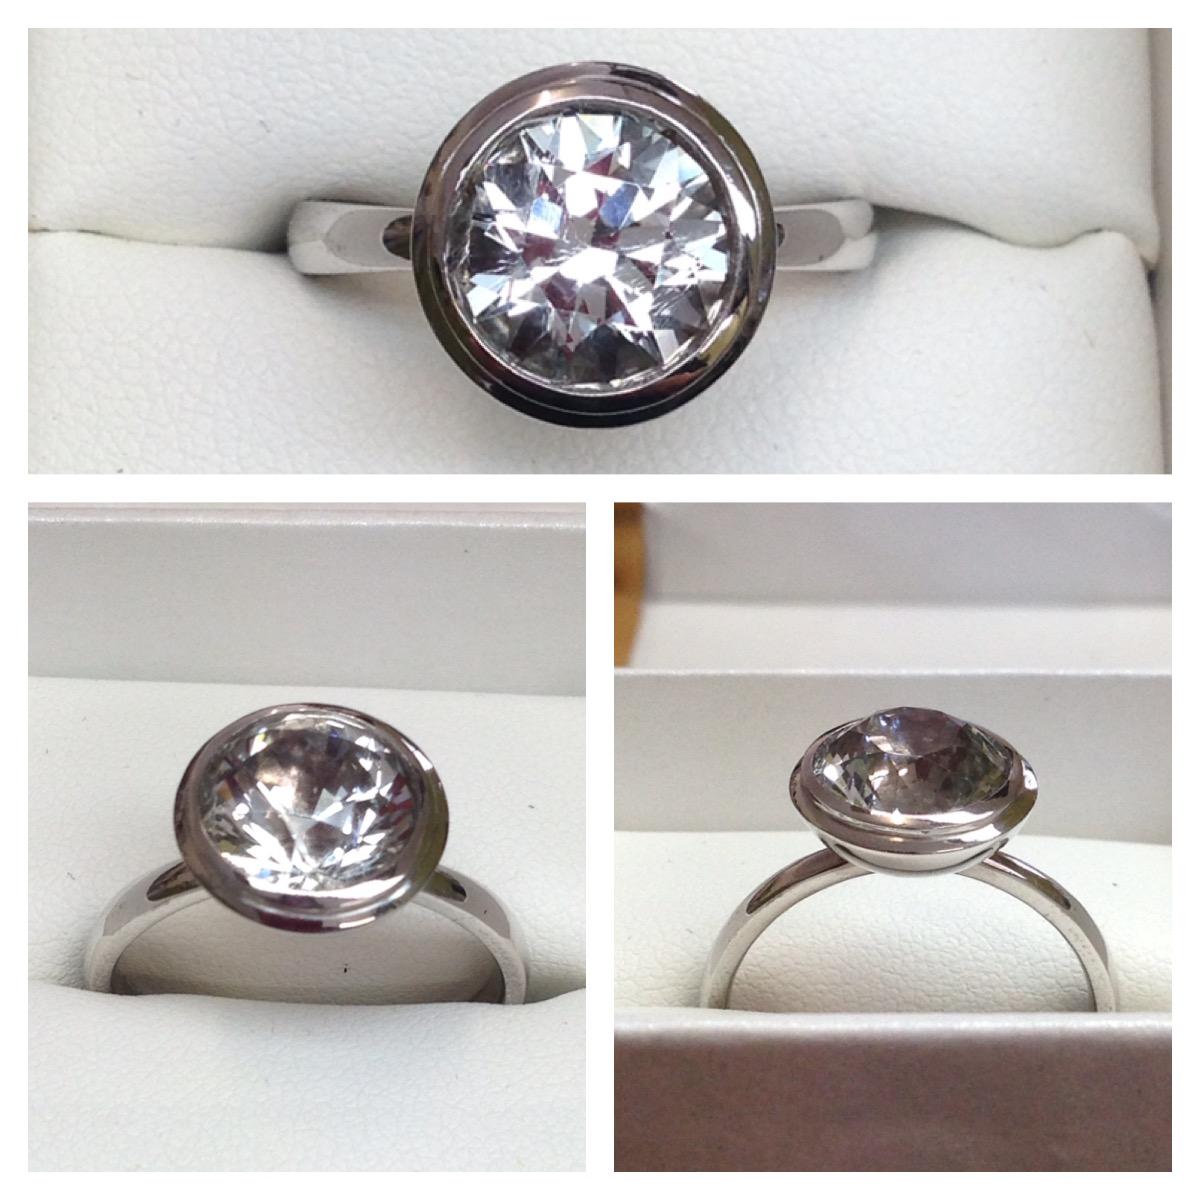 Killiecrankie Diamond Ring made by Lanique Design